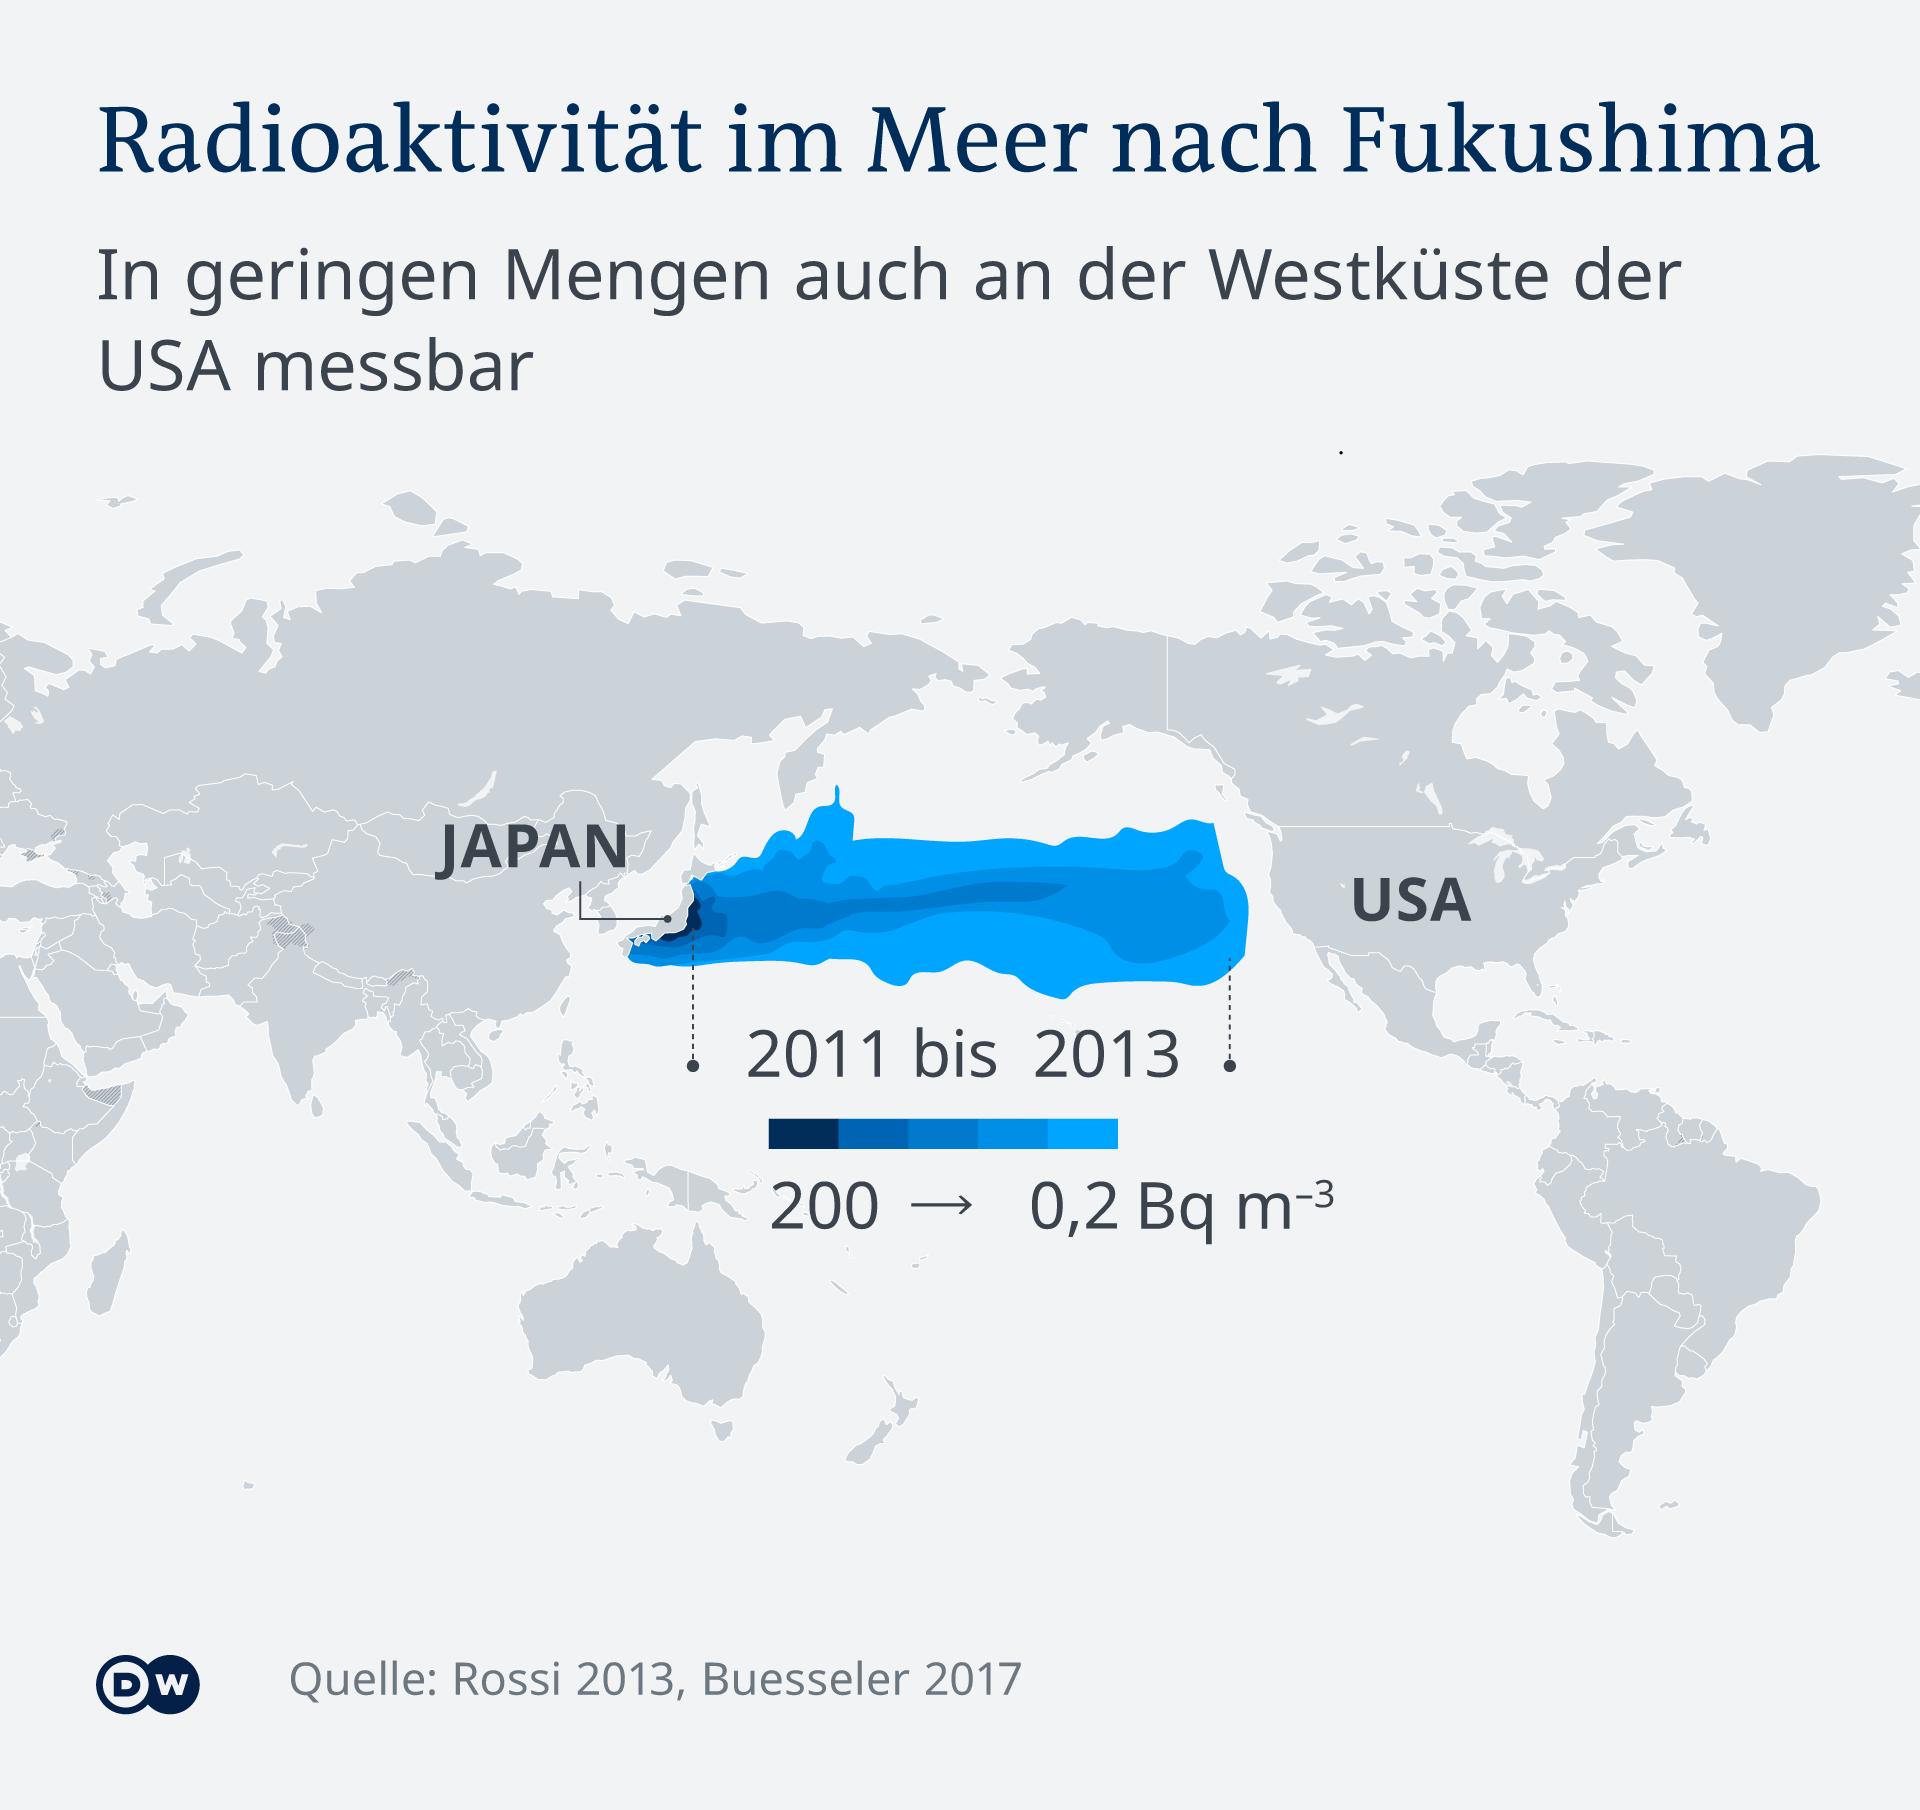 Infografik - Radioaktivität im Meer nach Fukushima - DE